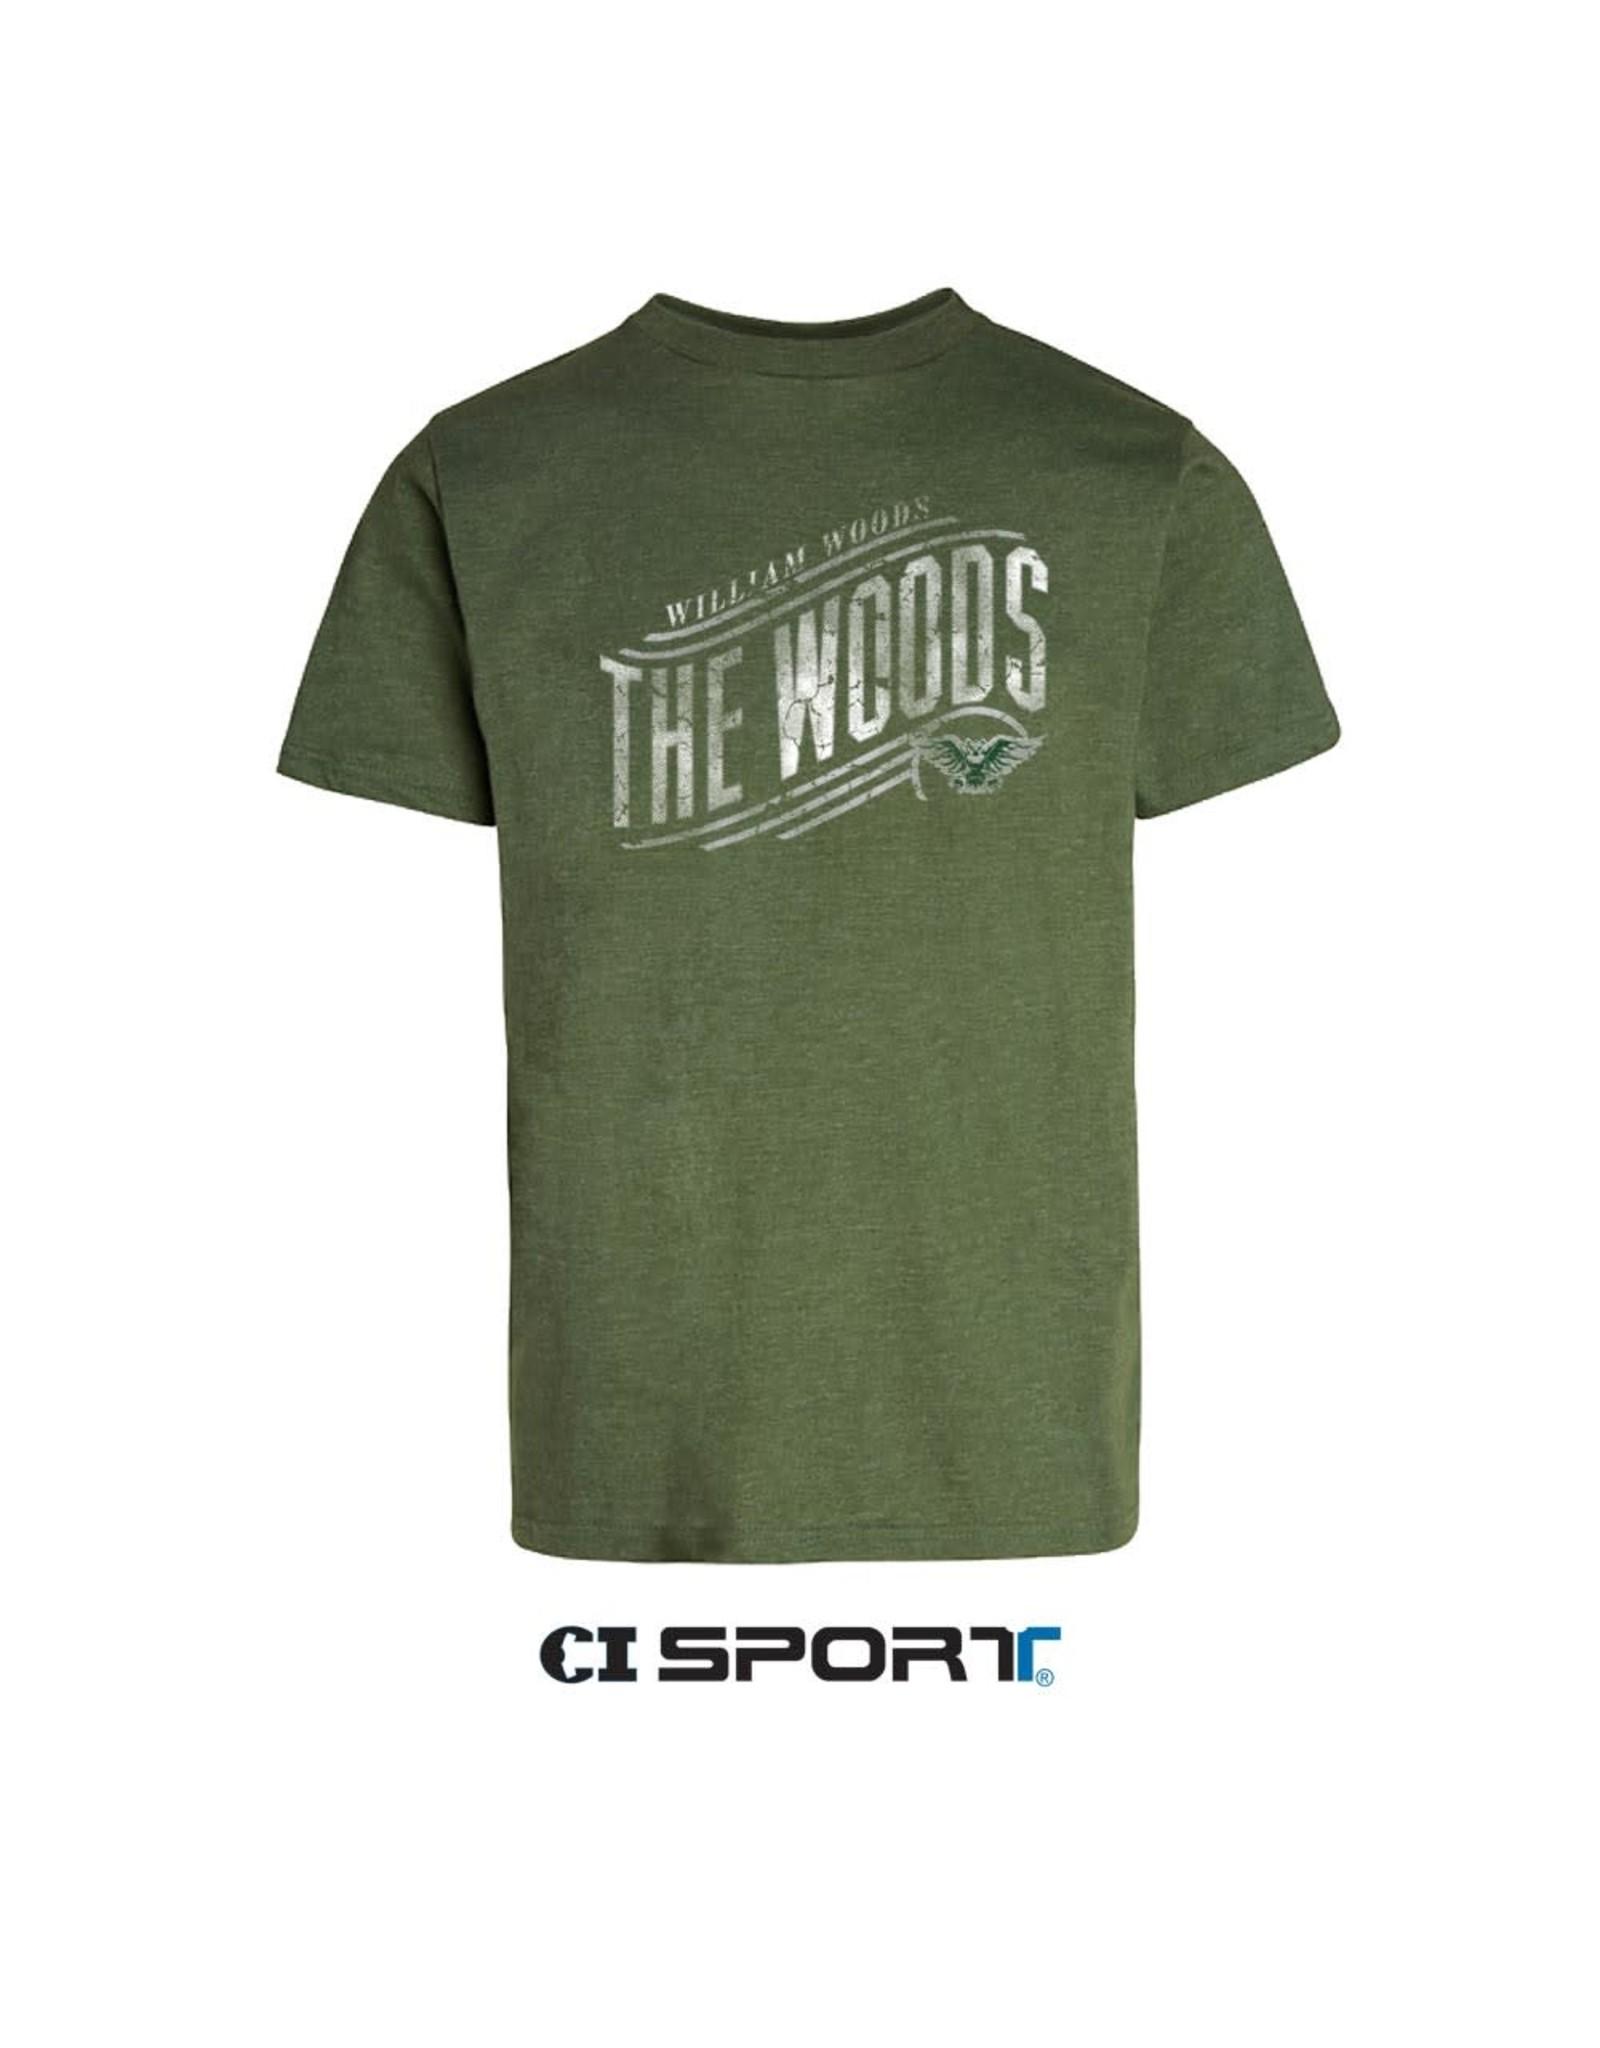 Premium SS Tee The Woods